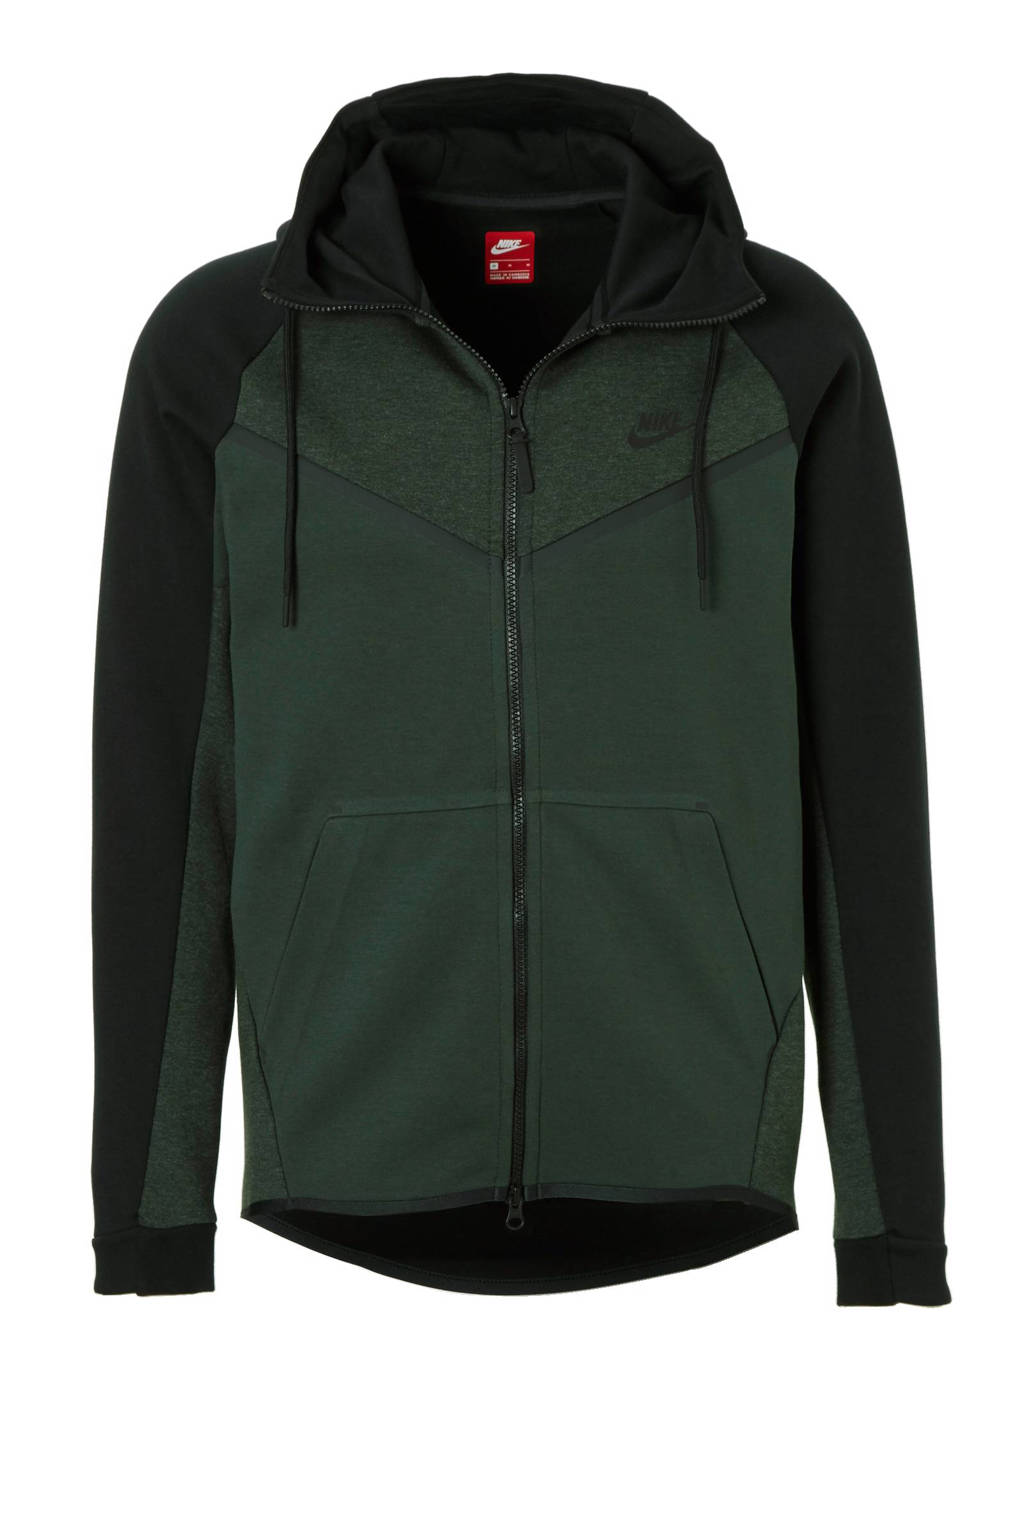 38bb53fc63c Nike Tech Fleece vest, Zwart/groen